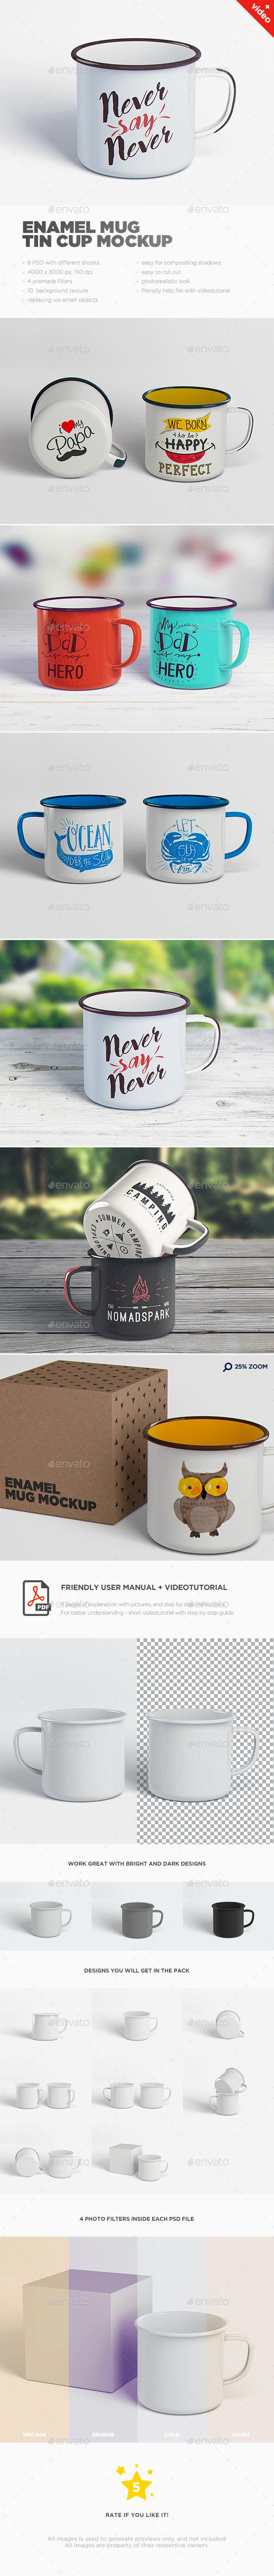 Enamel Mug / Tin Cup MockUp - Food and Drink Packaging